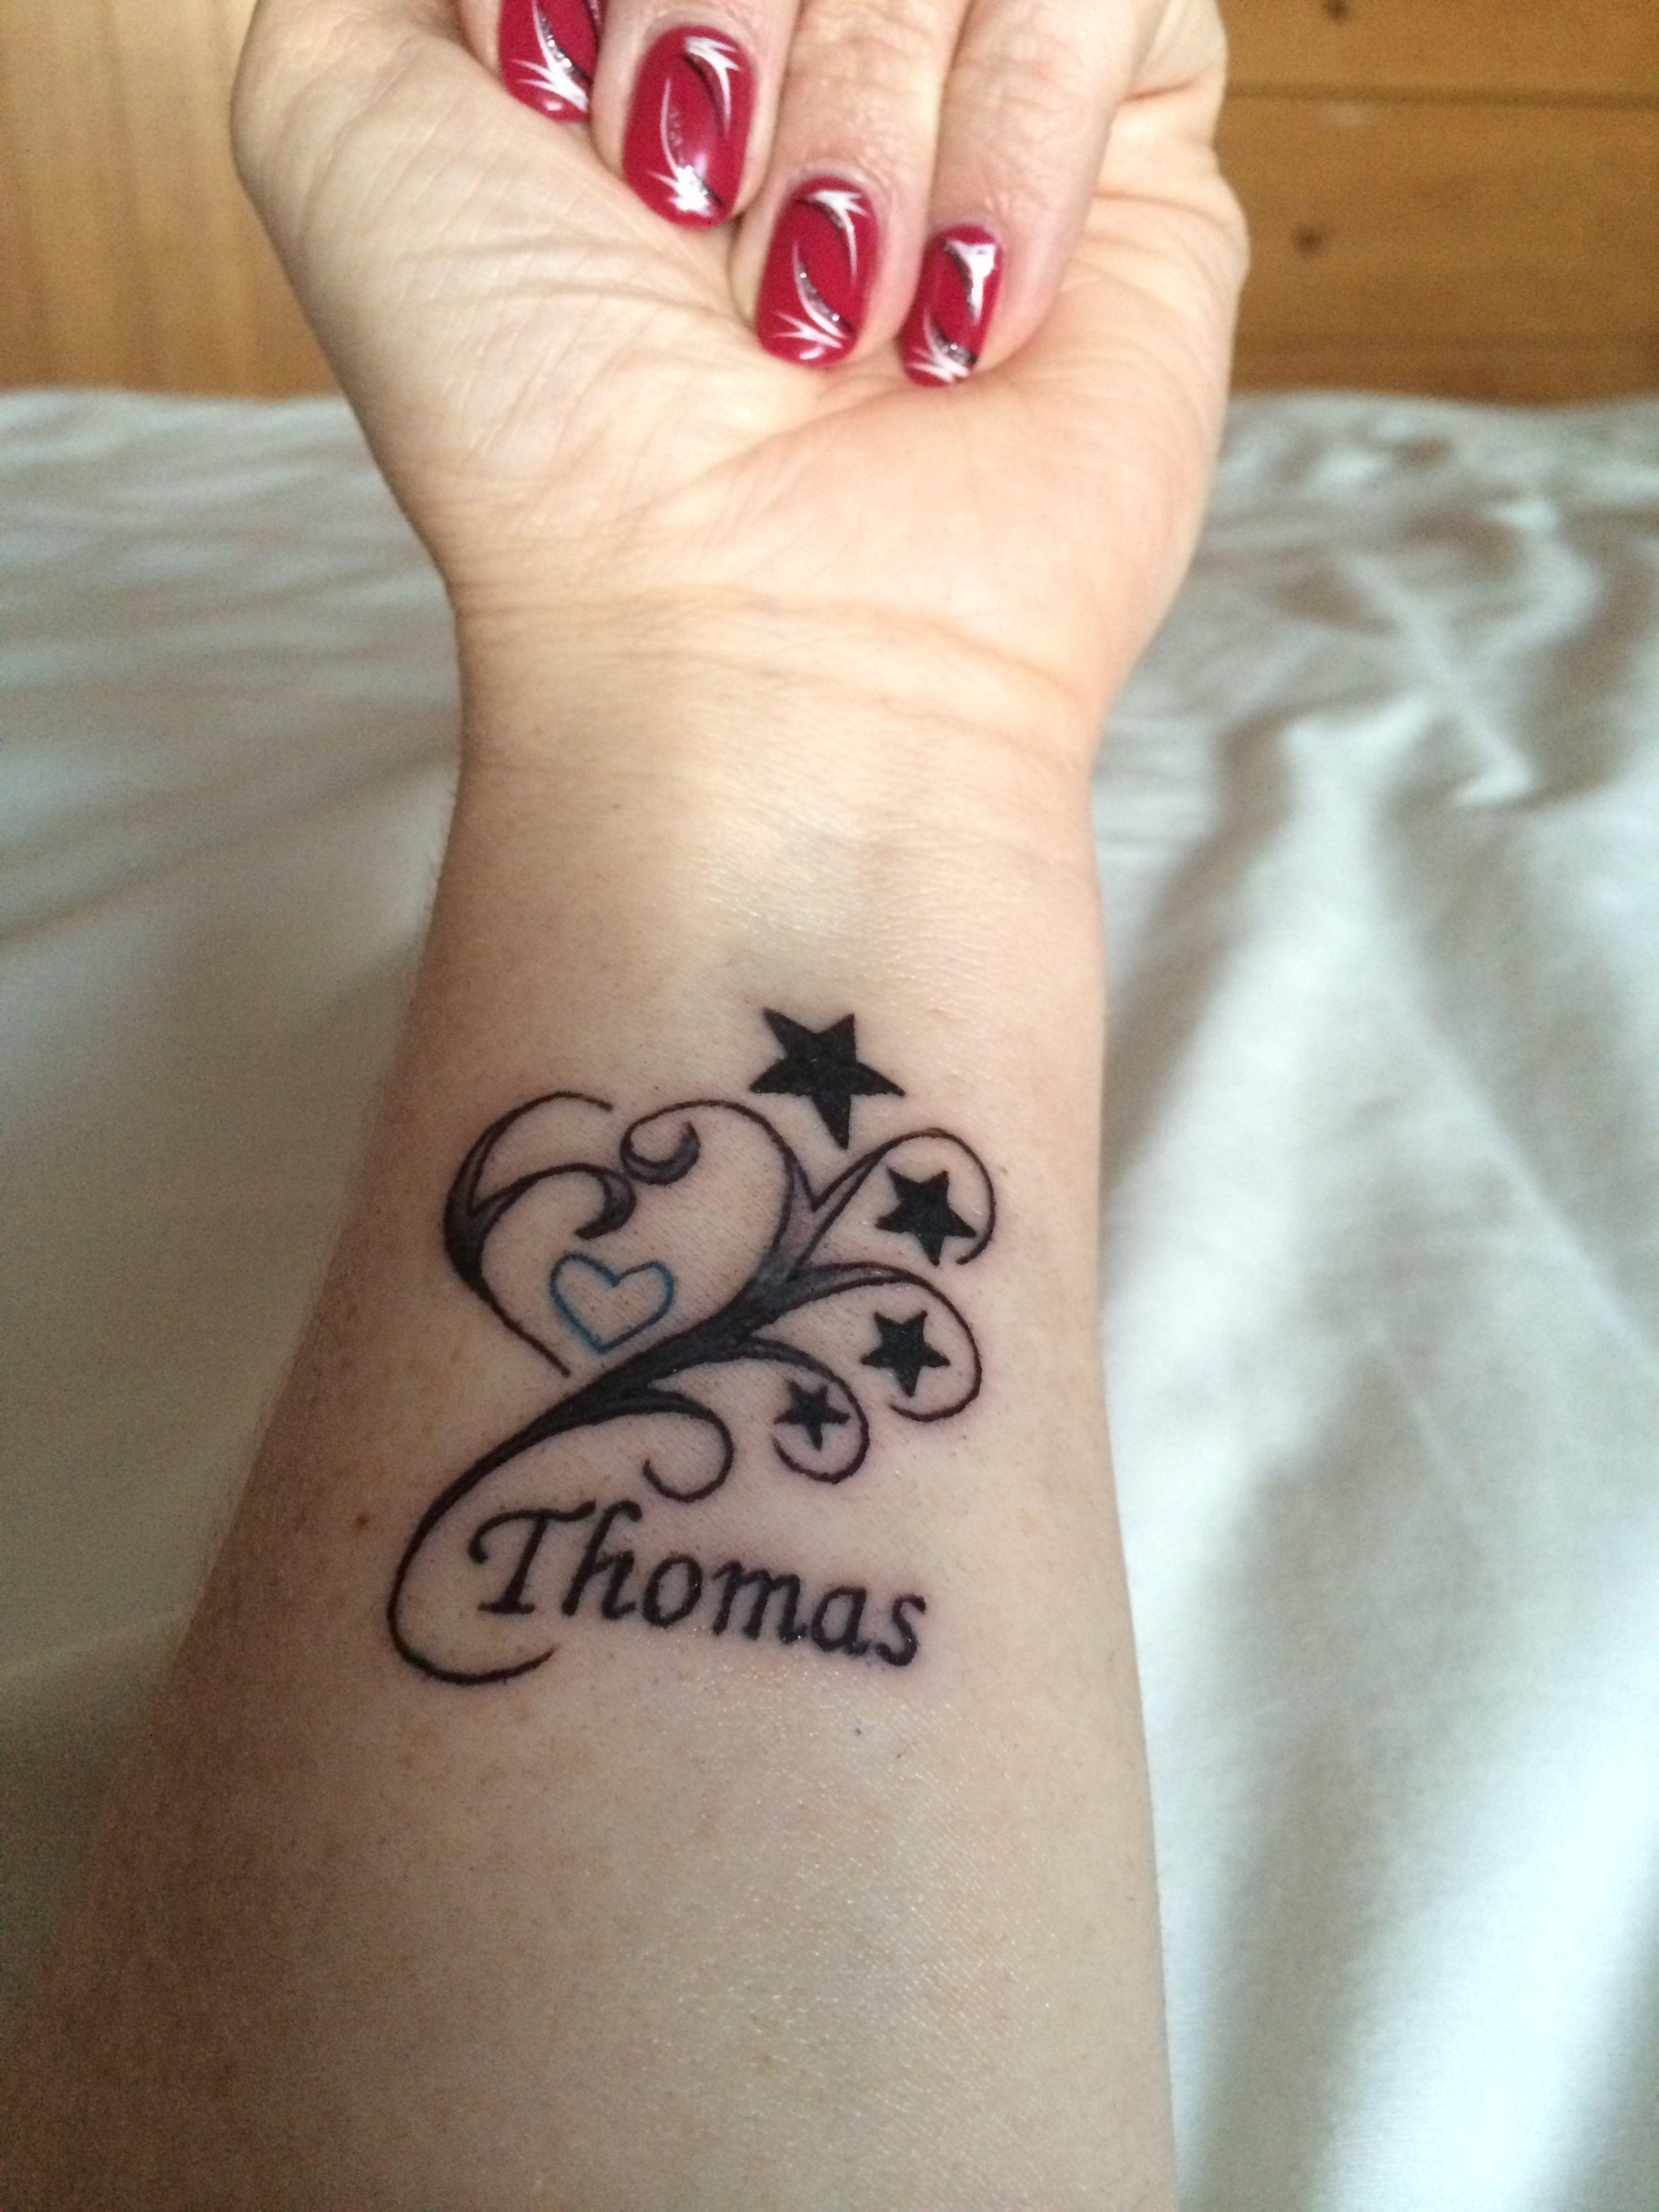 Wrist Arm Tattoo Son Thomas. Blue